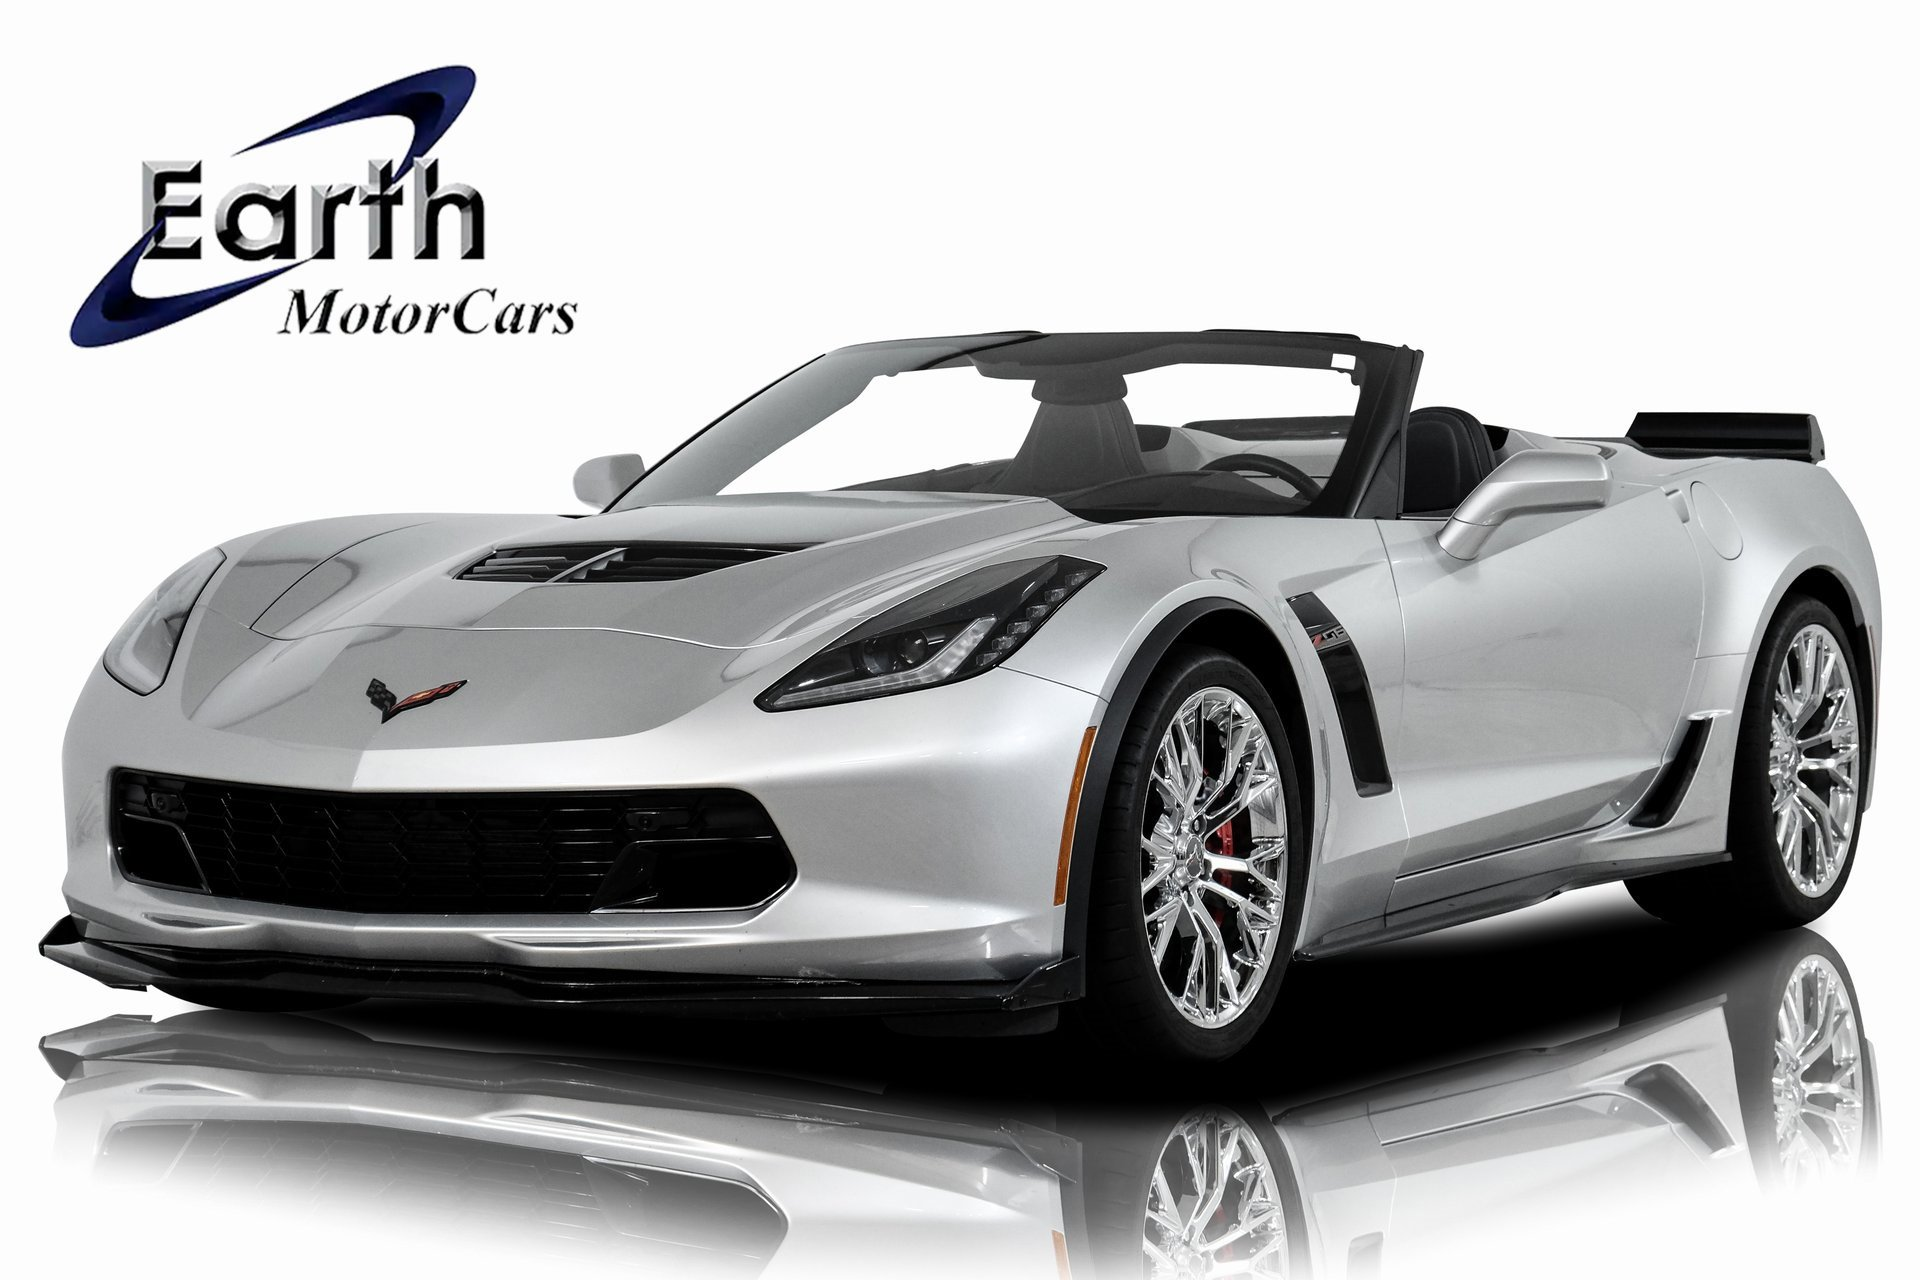 2016 Chevrolet Corvette Z06 Convertible image